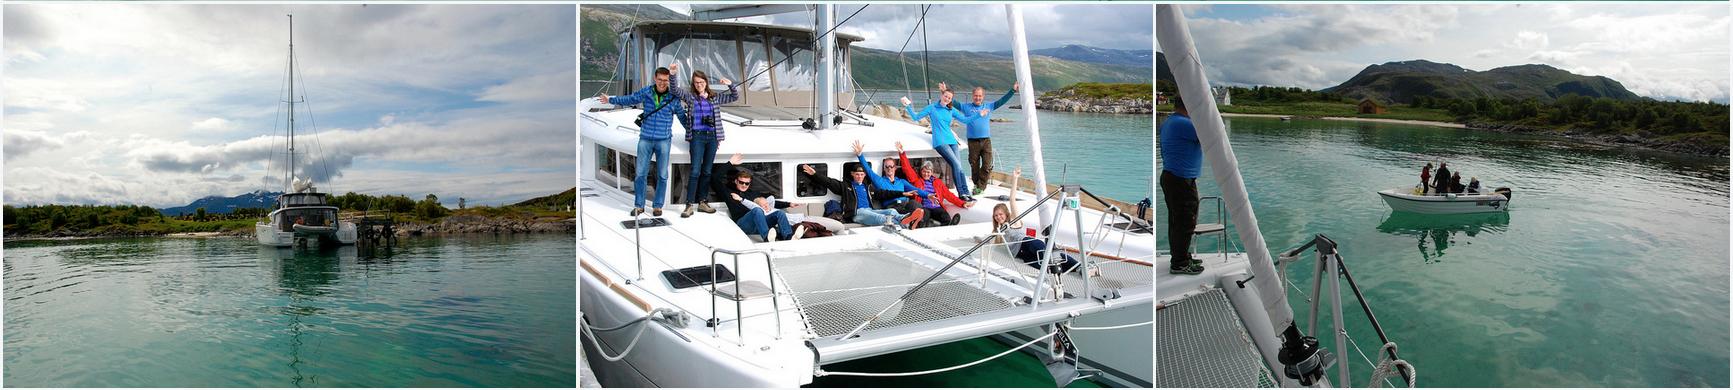 Sail and Relax |Arctic Princess |Tromso